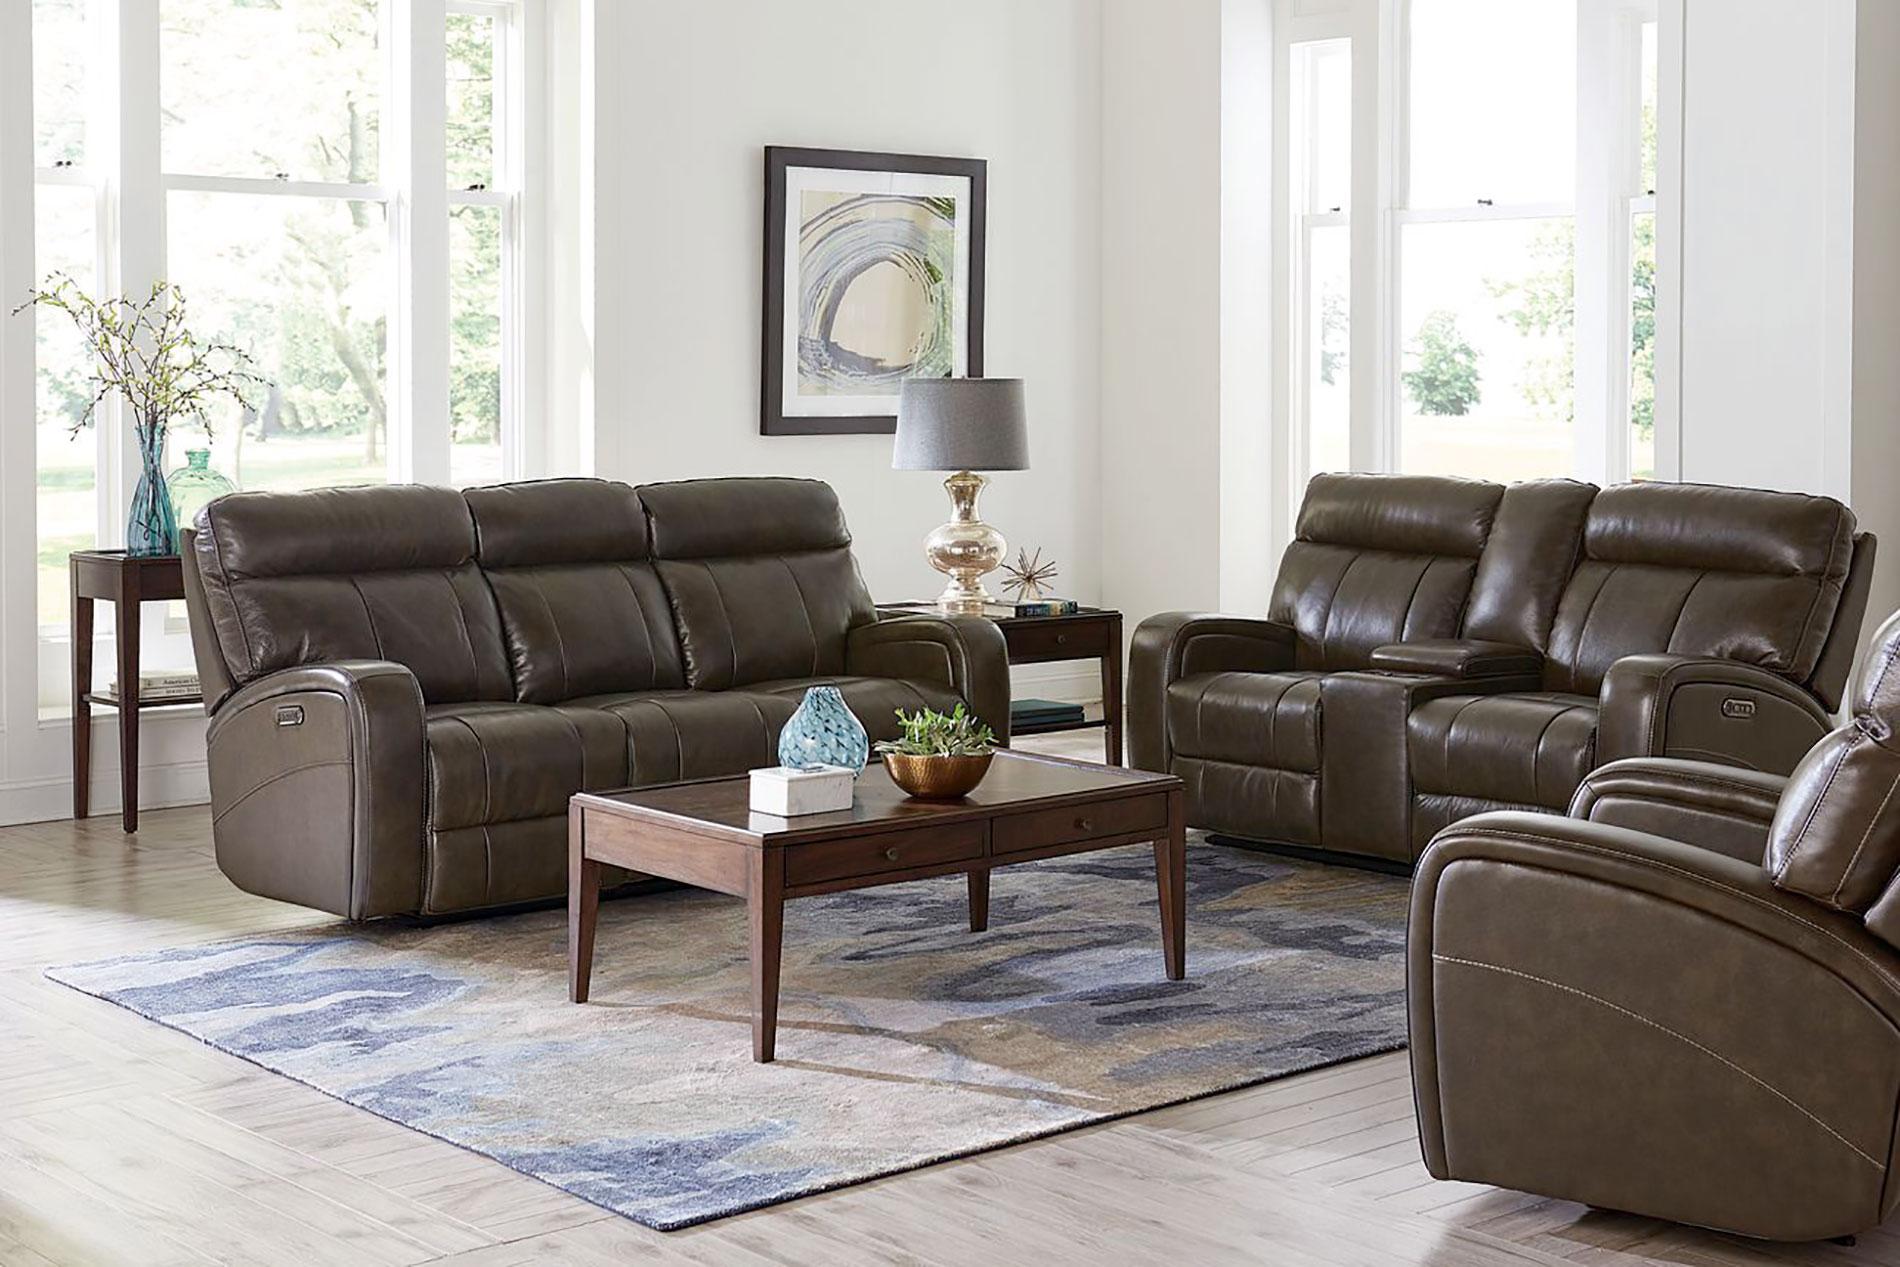 Superior Club Level By Bassett   Bassett Furniture